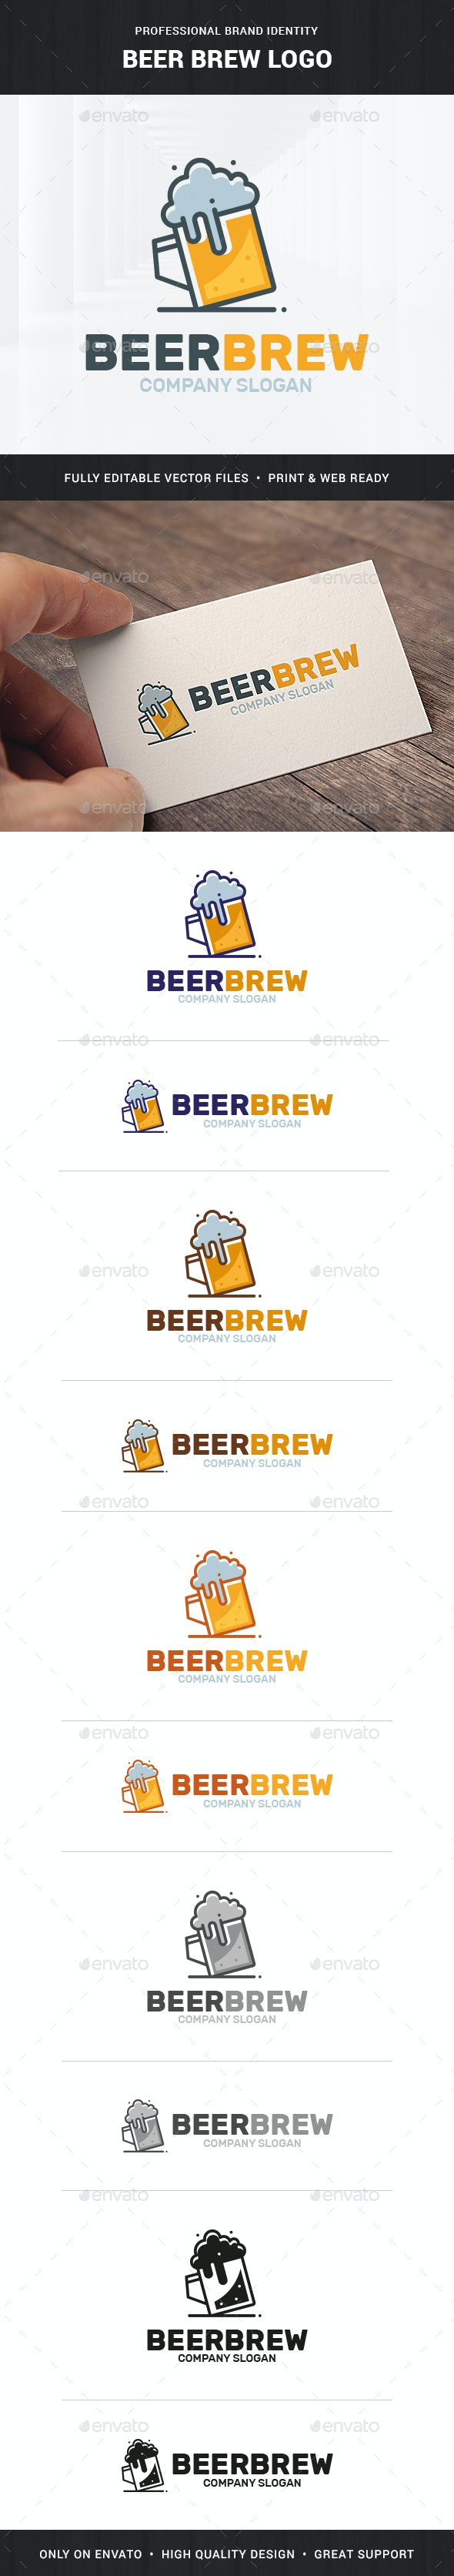 Beer Brew Logo Template - Food Logo Templates